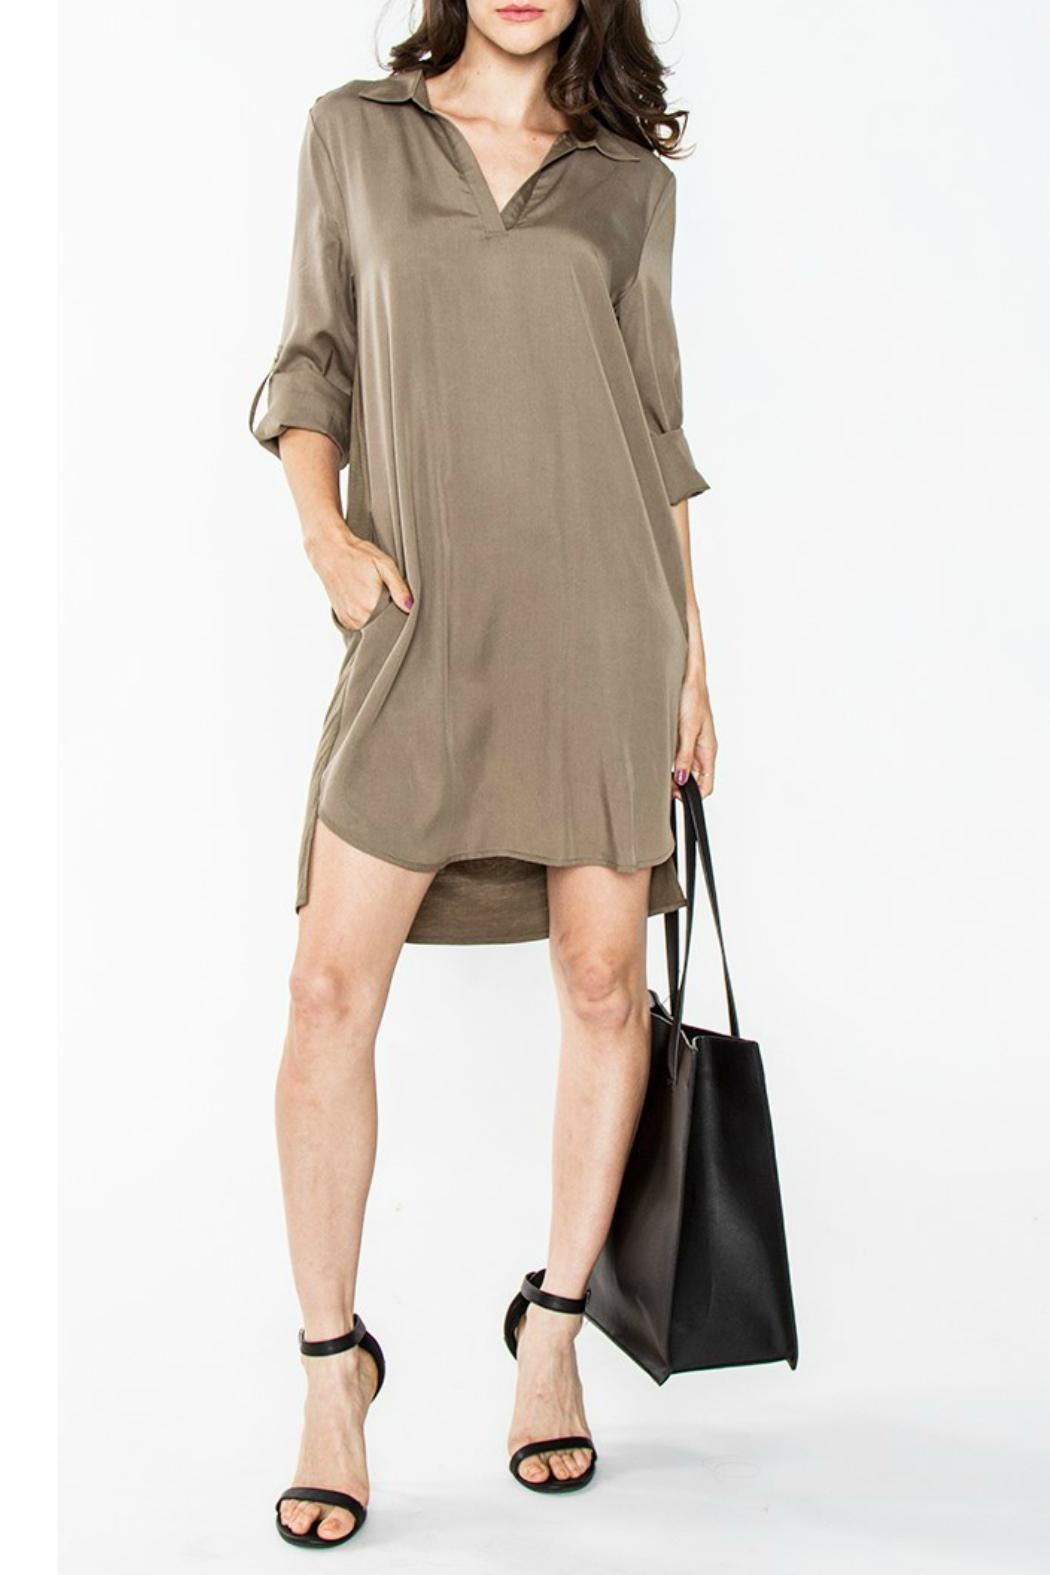 Sugarlips olive shirt dress olive shirt long sleeve shirt dress